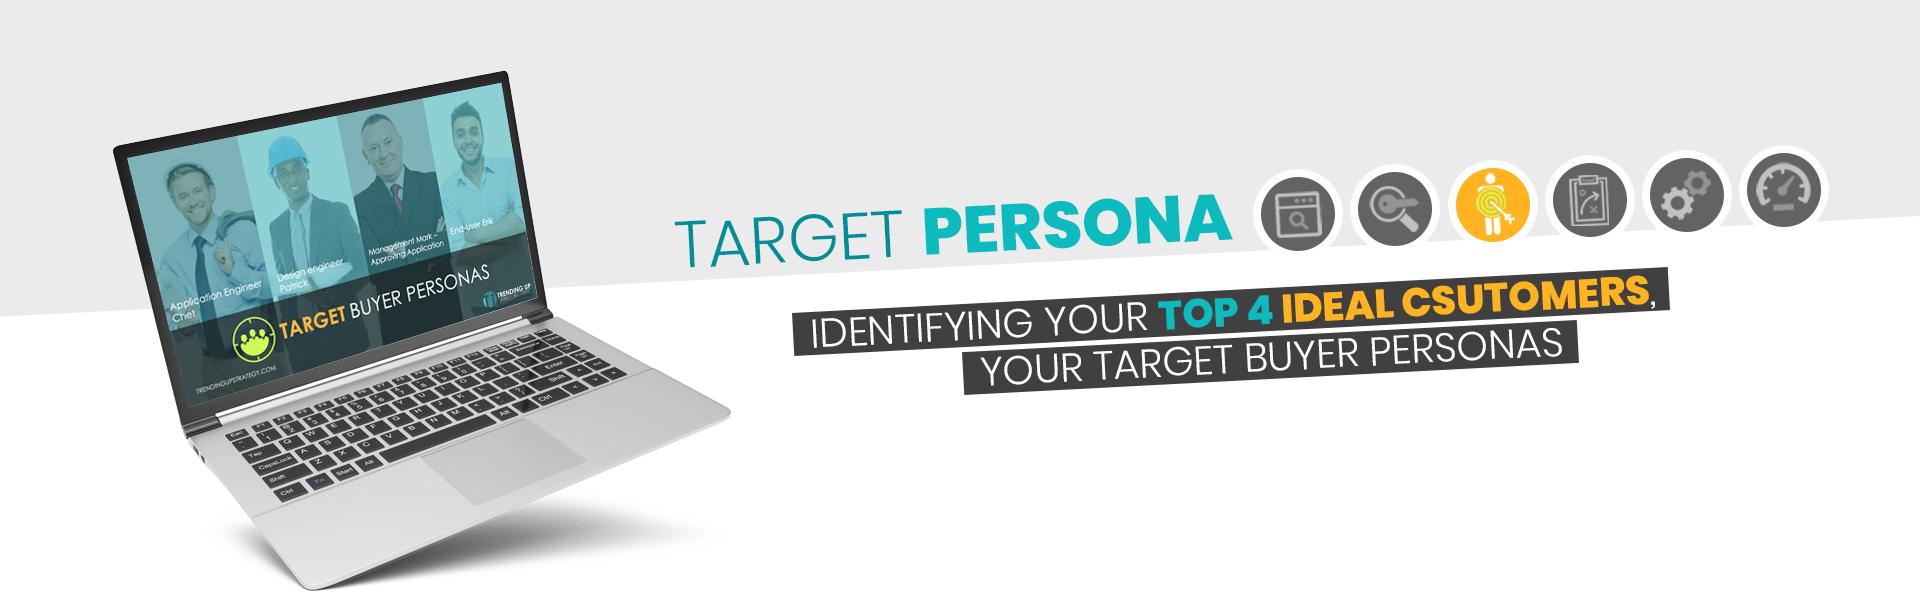 Target Persona - Top 4